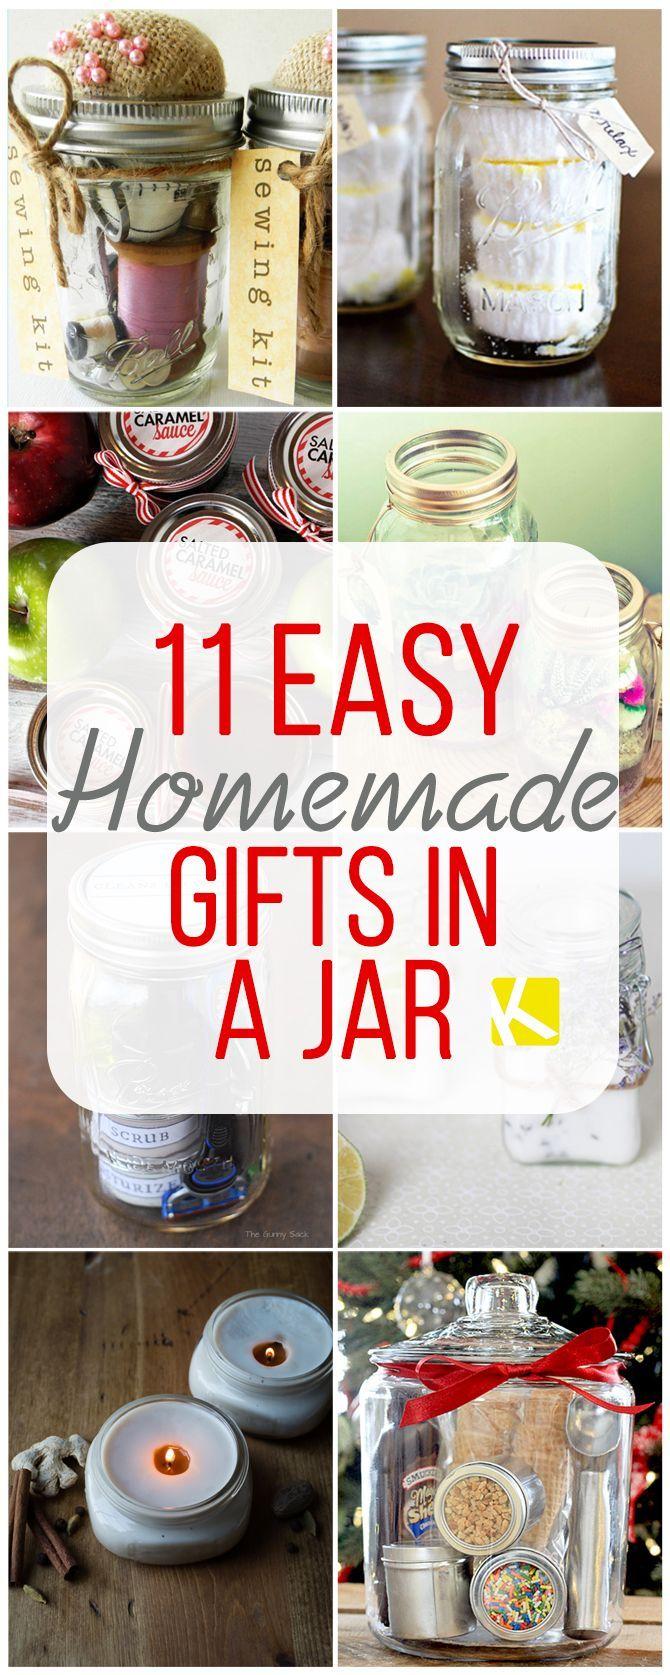 11 Diy Mason Jar Gift Ideas For Christmas Mason Jar Gifts Diy Mason Jar Diy Mason Jar Crafts Diy